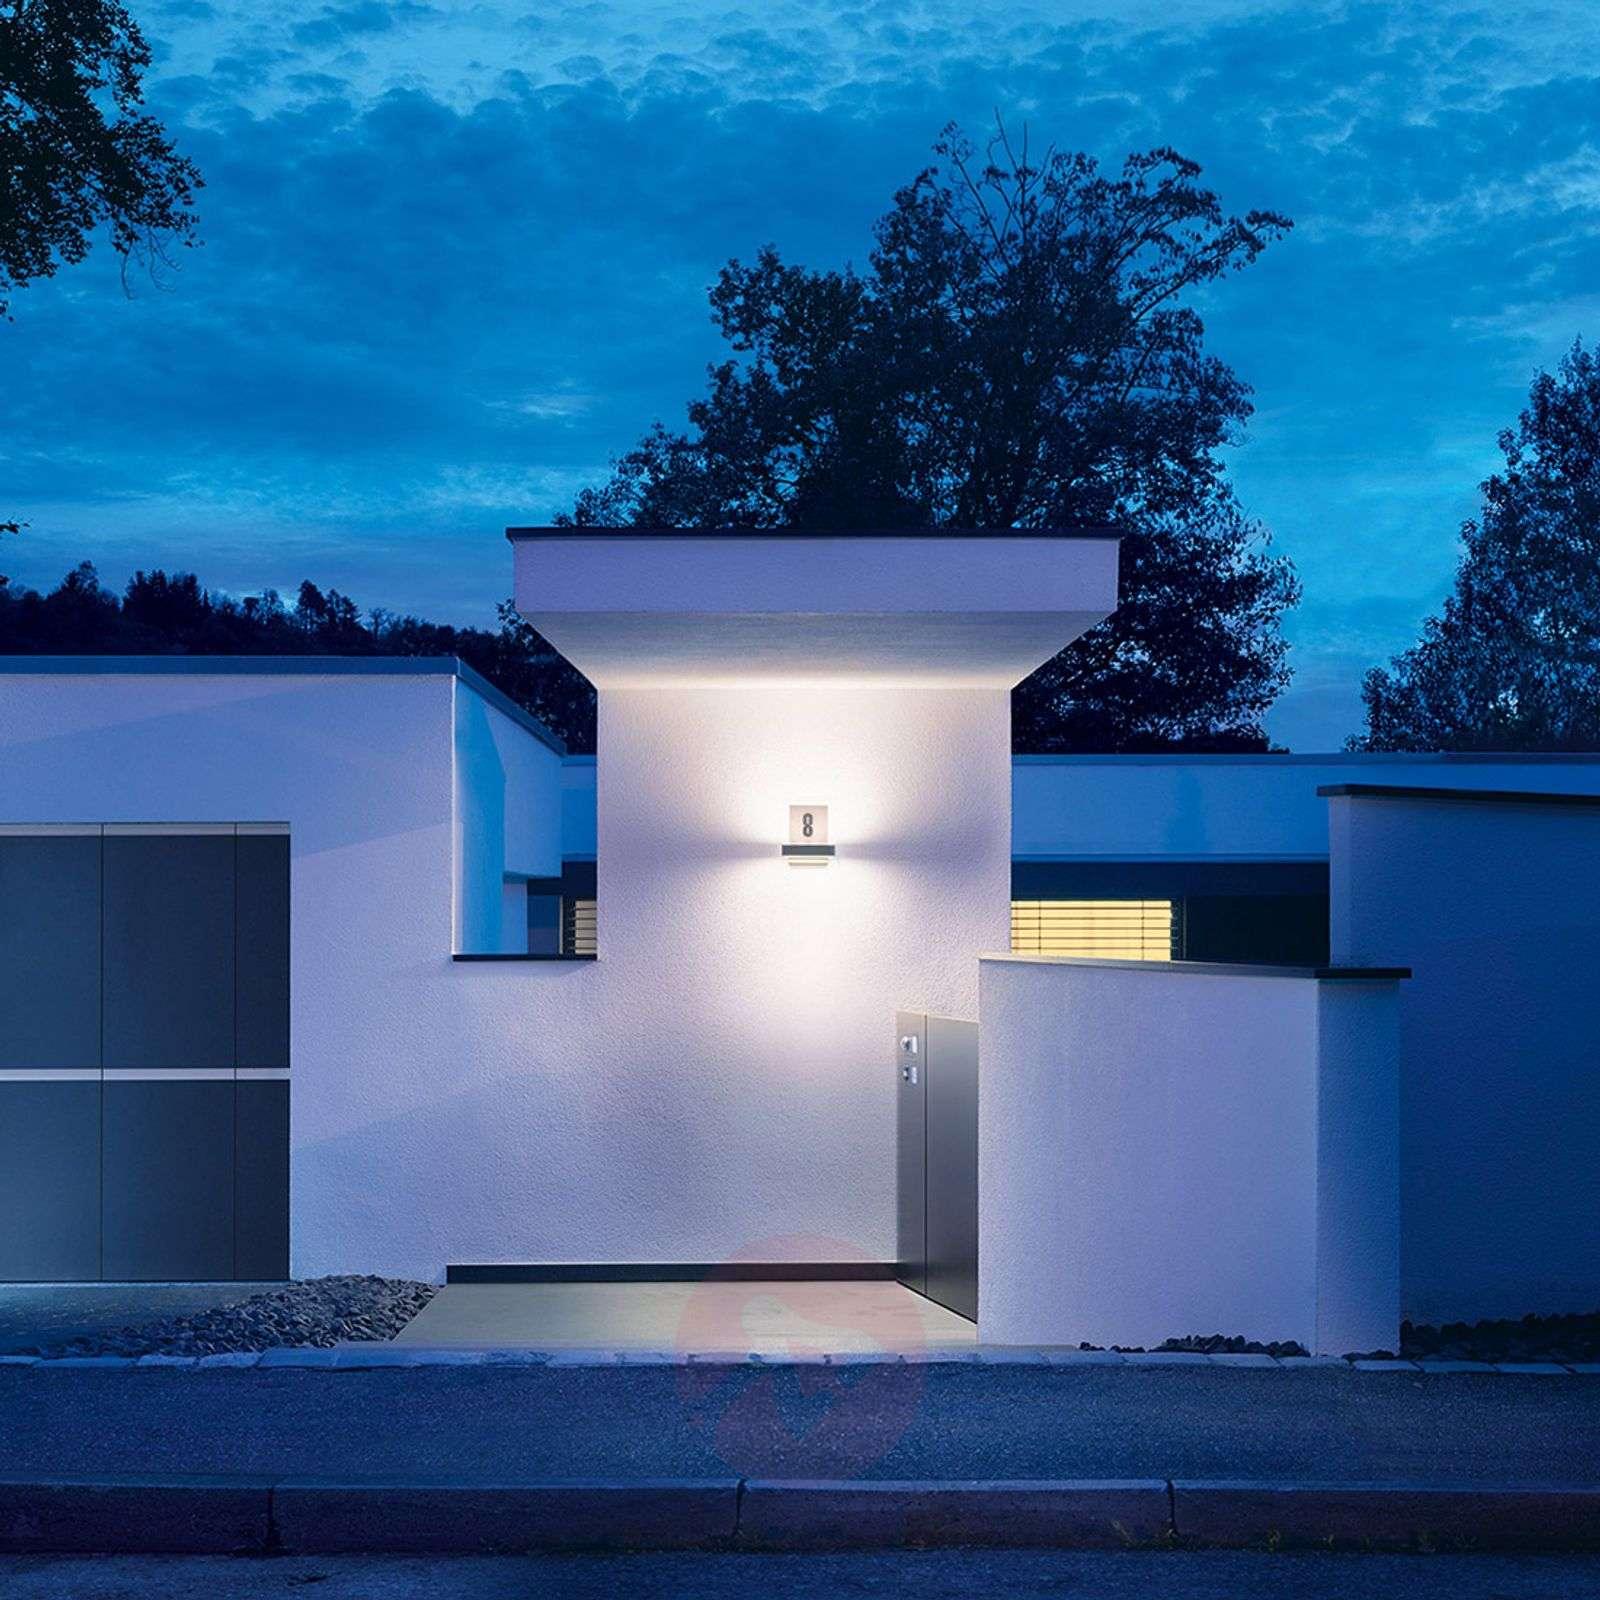 L 820 outdoor wall light Effective-8505620-017